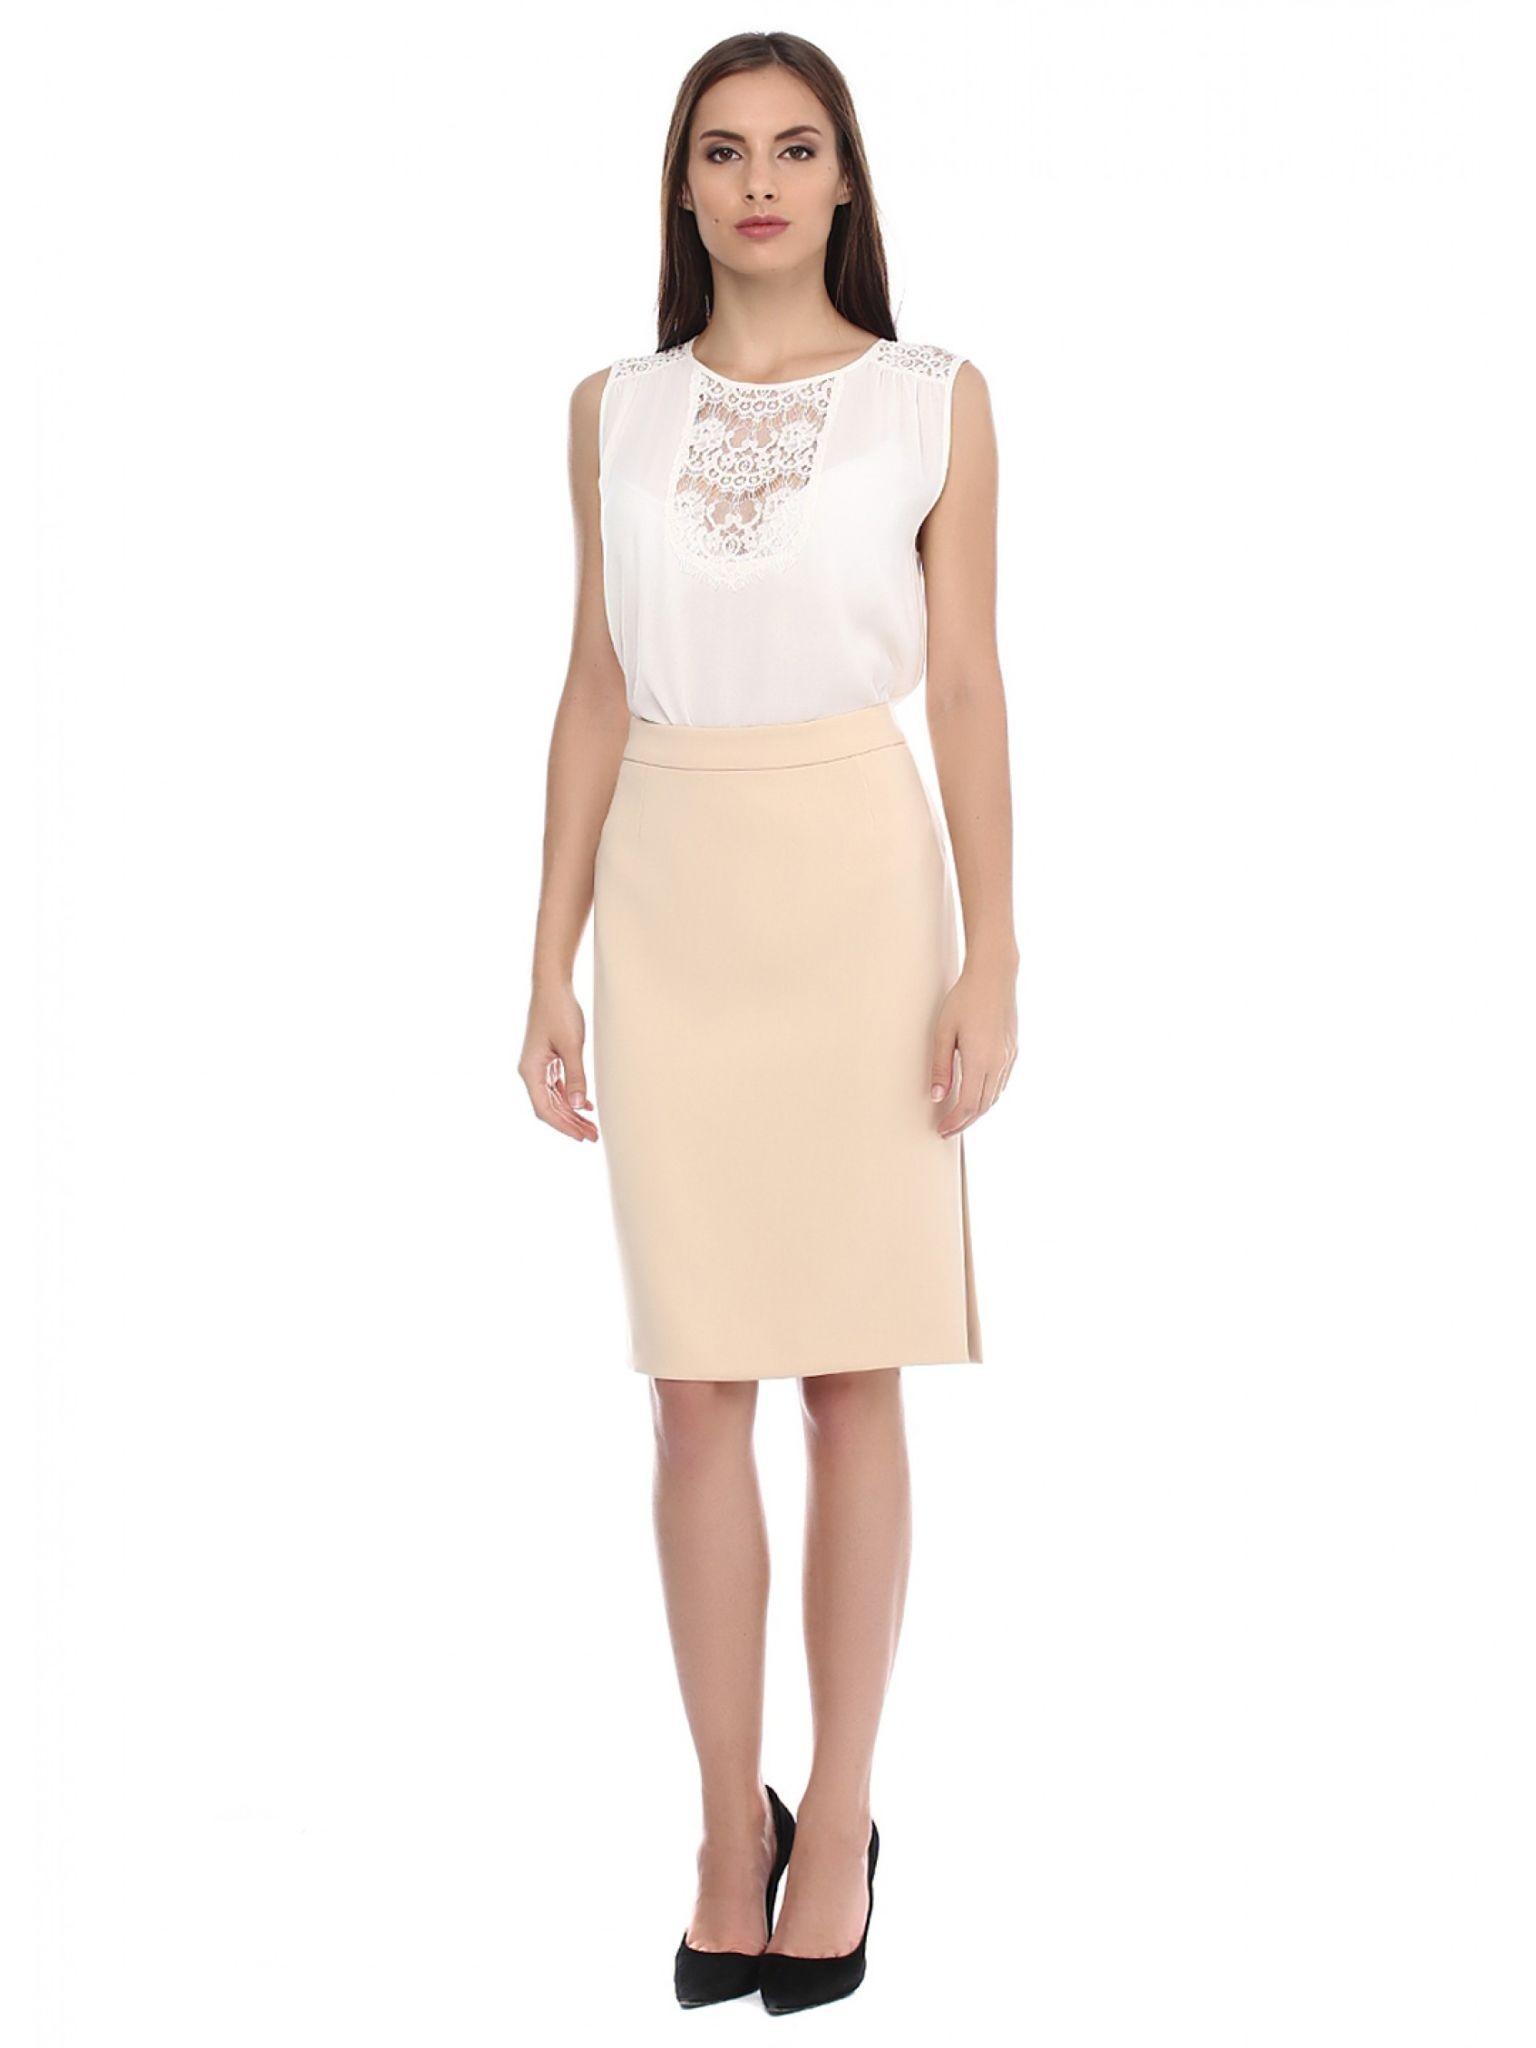 новогодний образ 2018: юбка карандаш под блузку белую